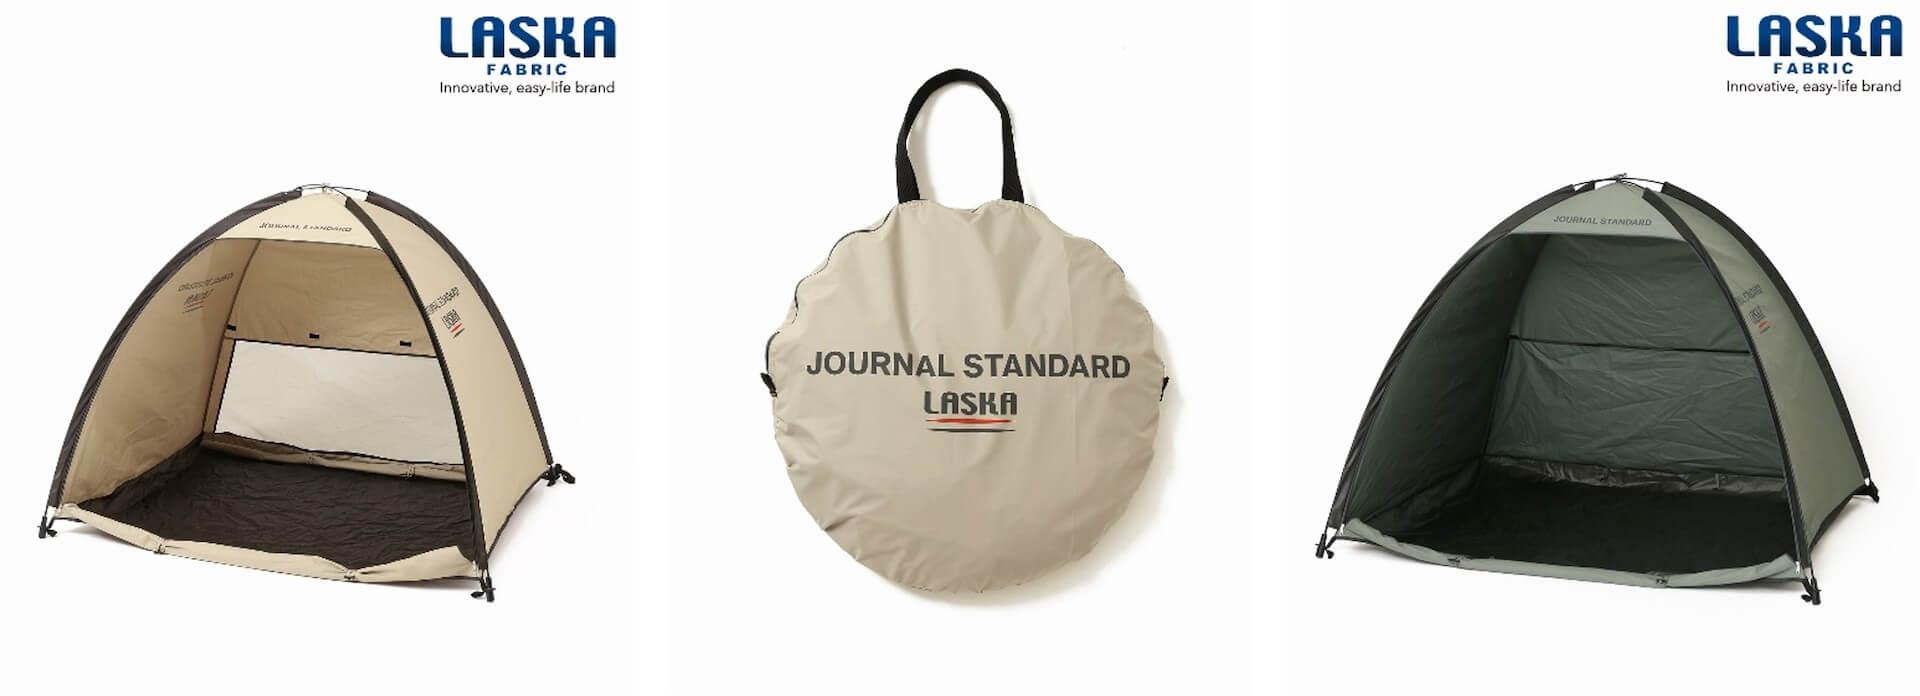 JOURNAL STANDARDの『LASKA PLAY』にポンチョ、テントなど梅雨シーズンにも利用できるアウトドア向けアイテム4点が登場! life210525_journalstandard_laska_2